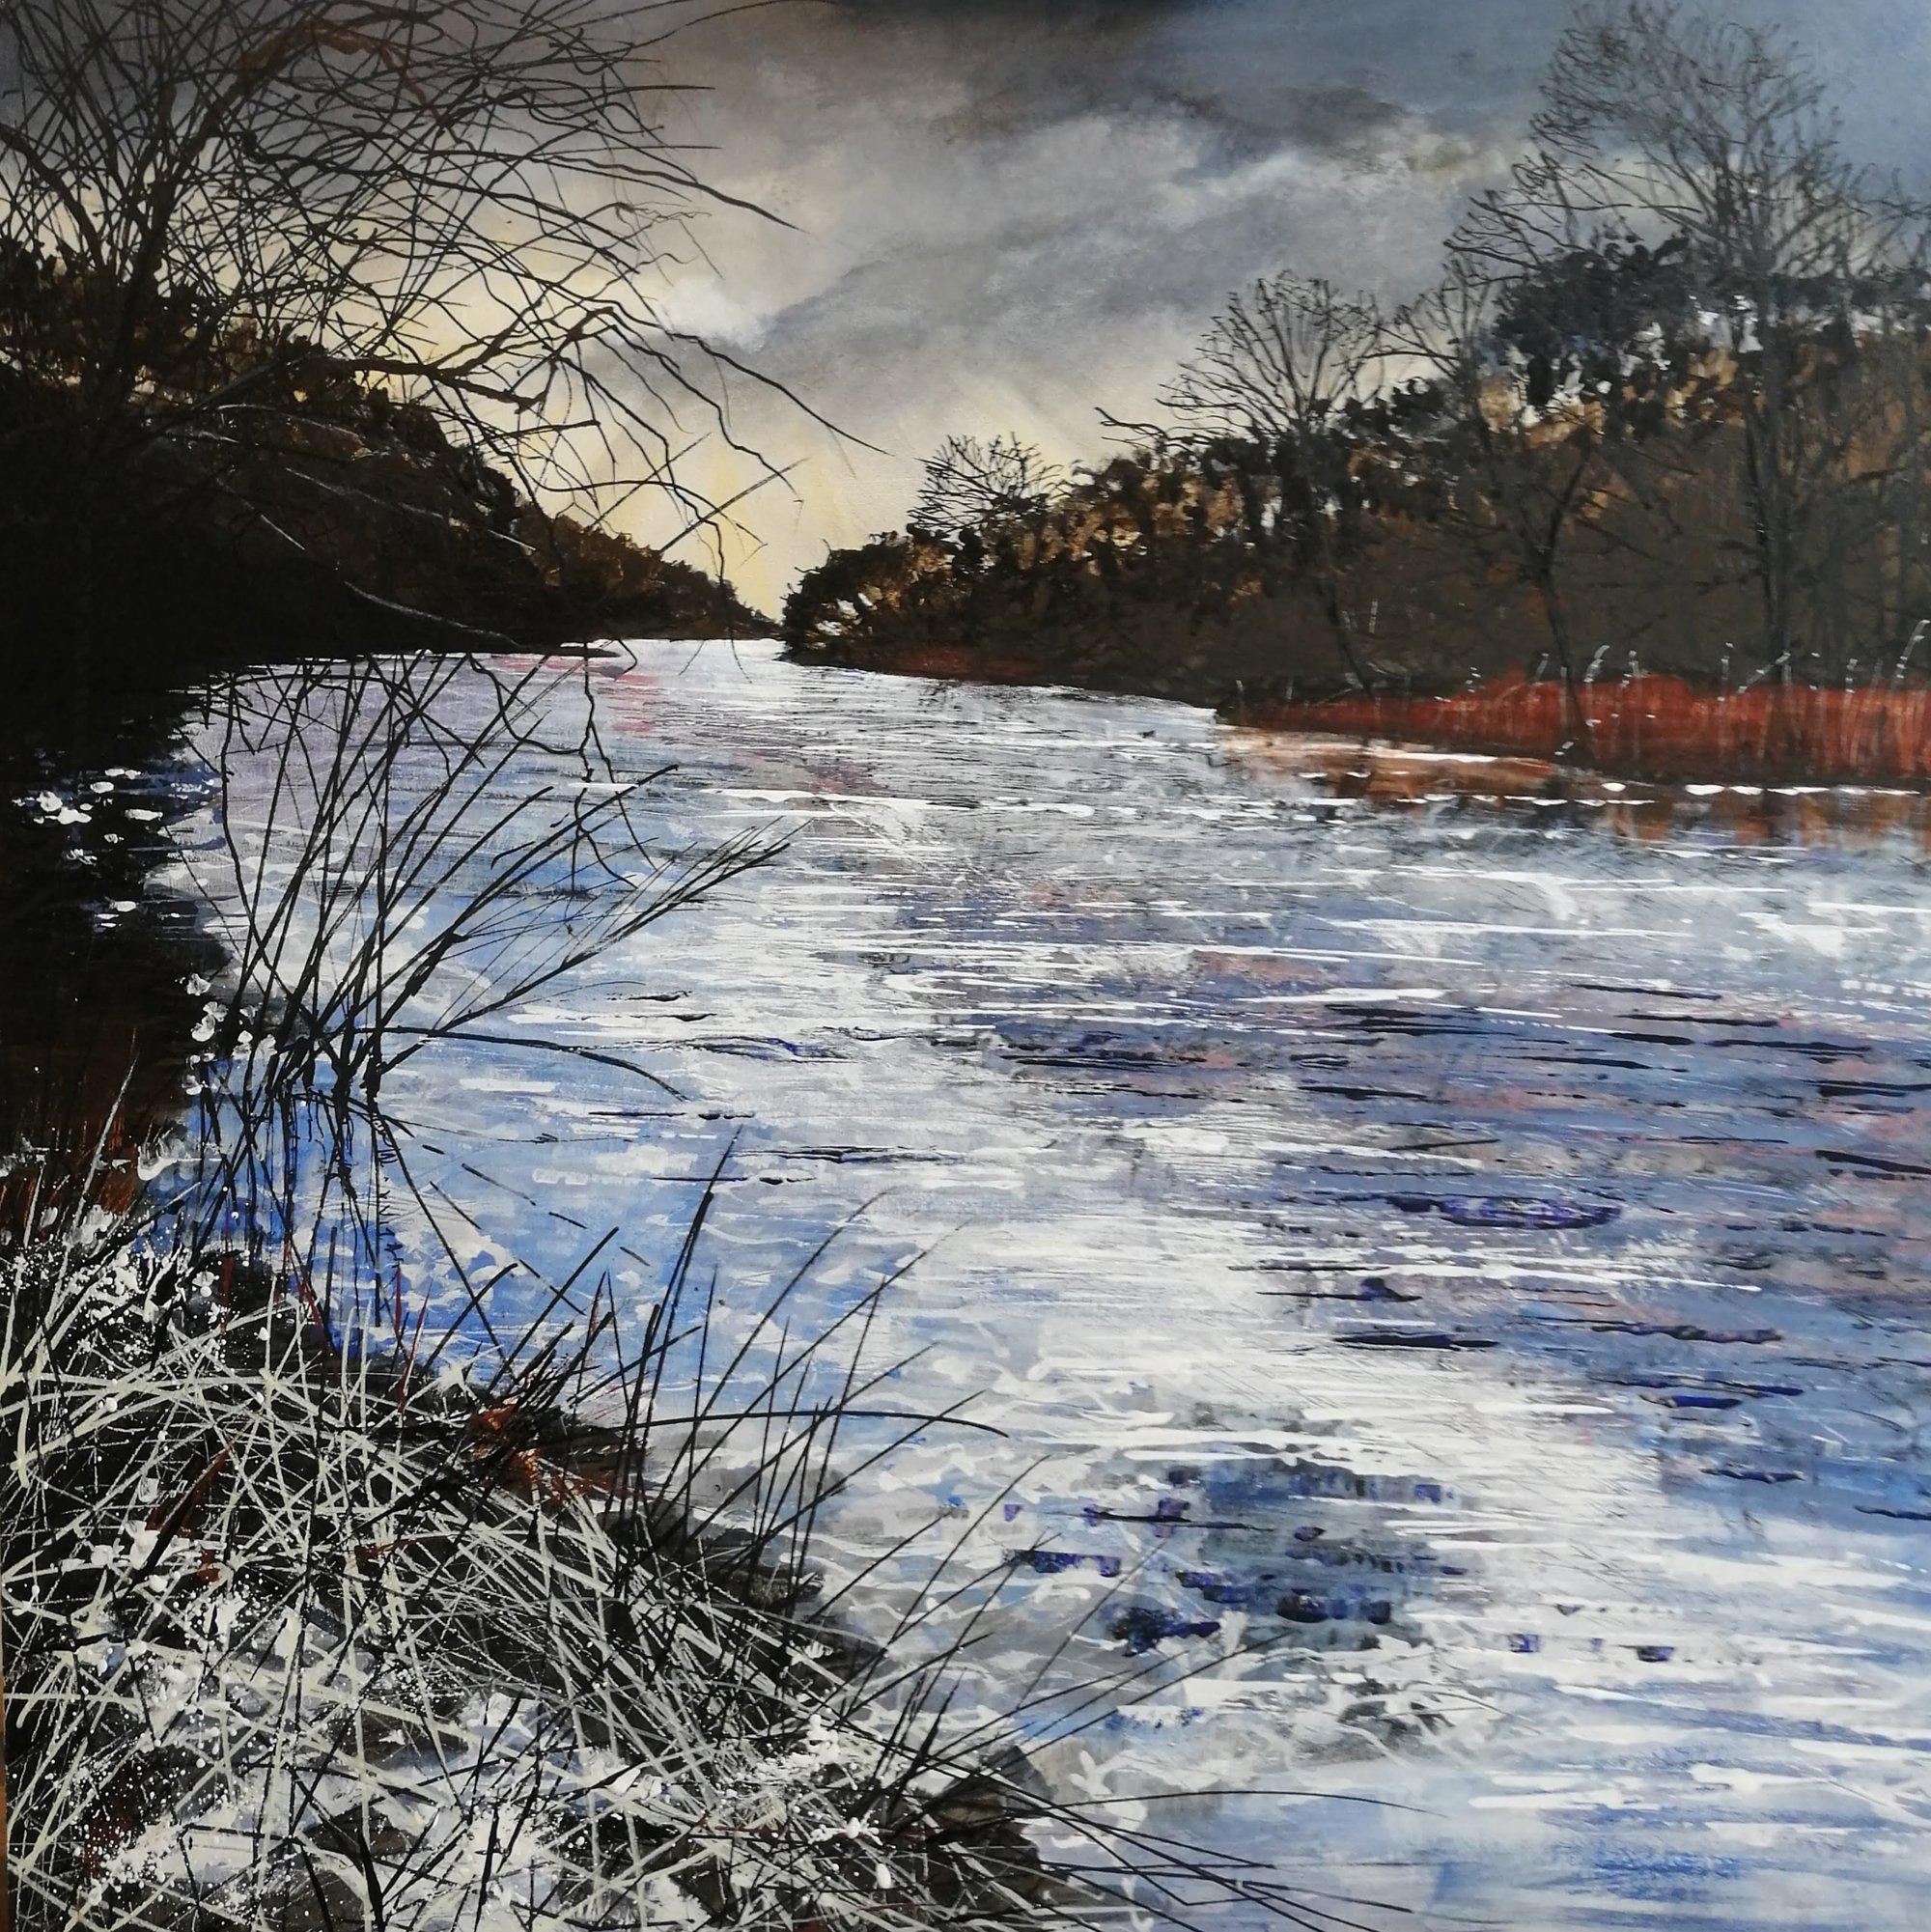 Swollen Winter River Original Landscape Art